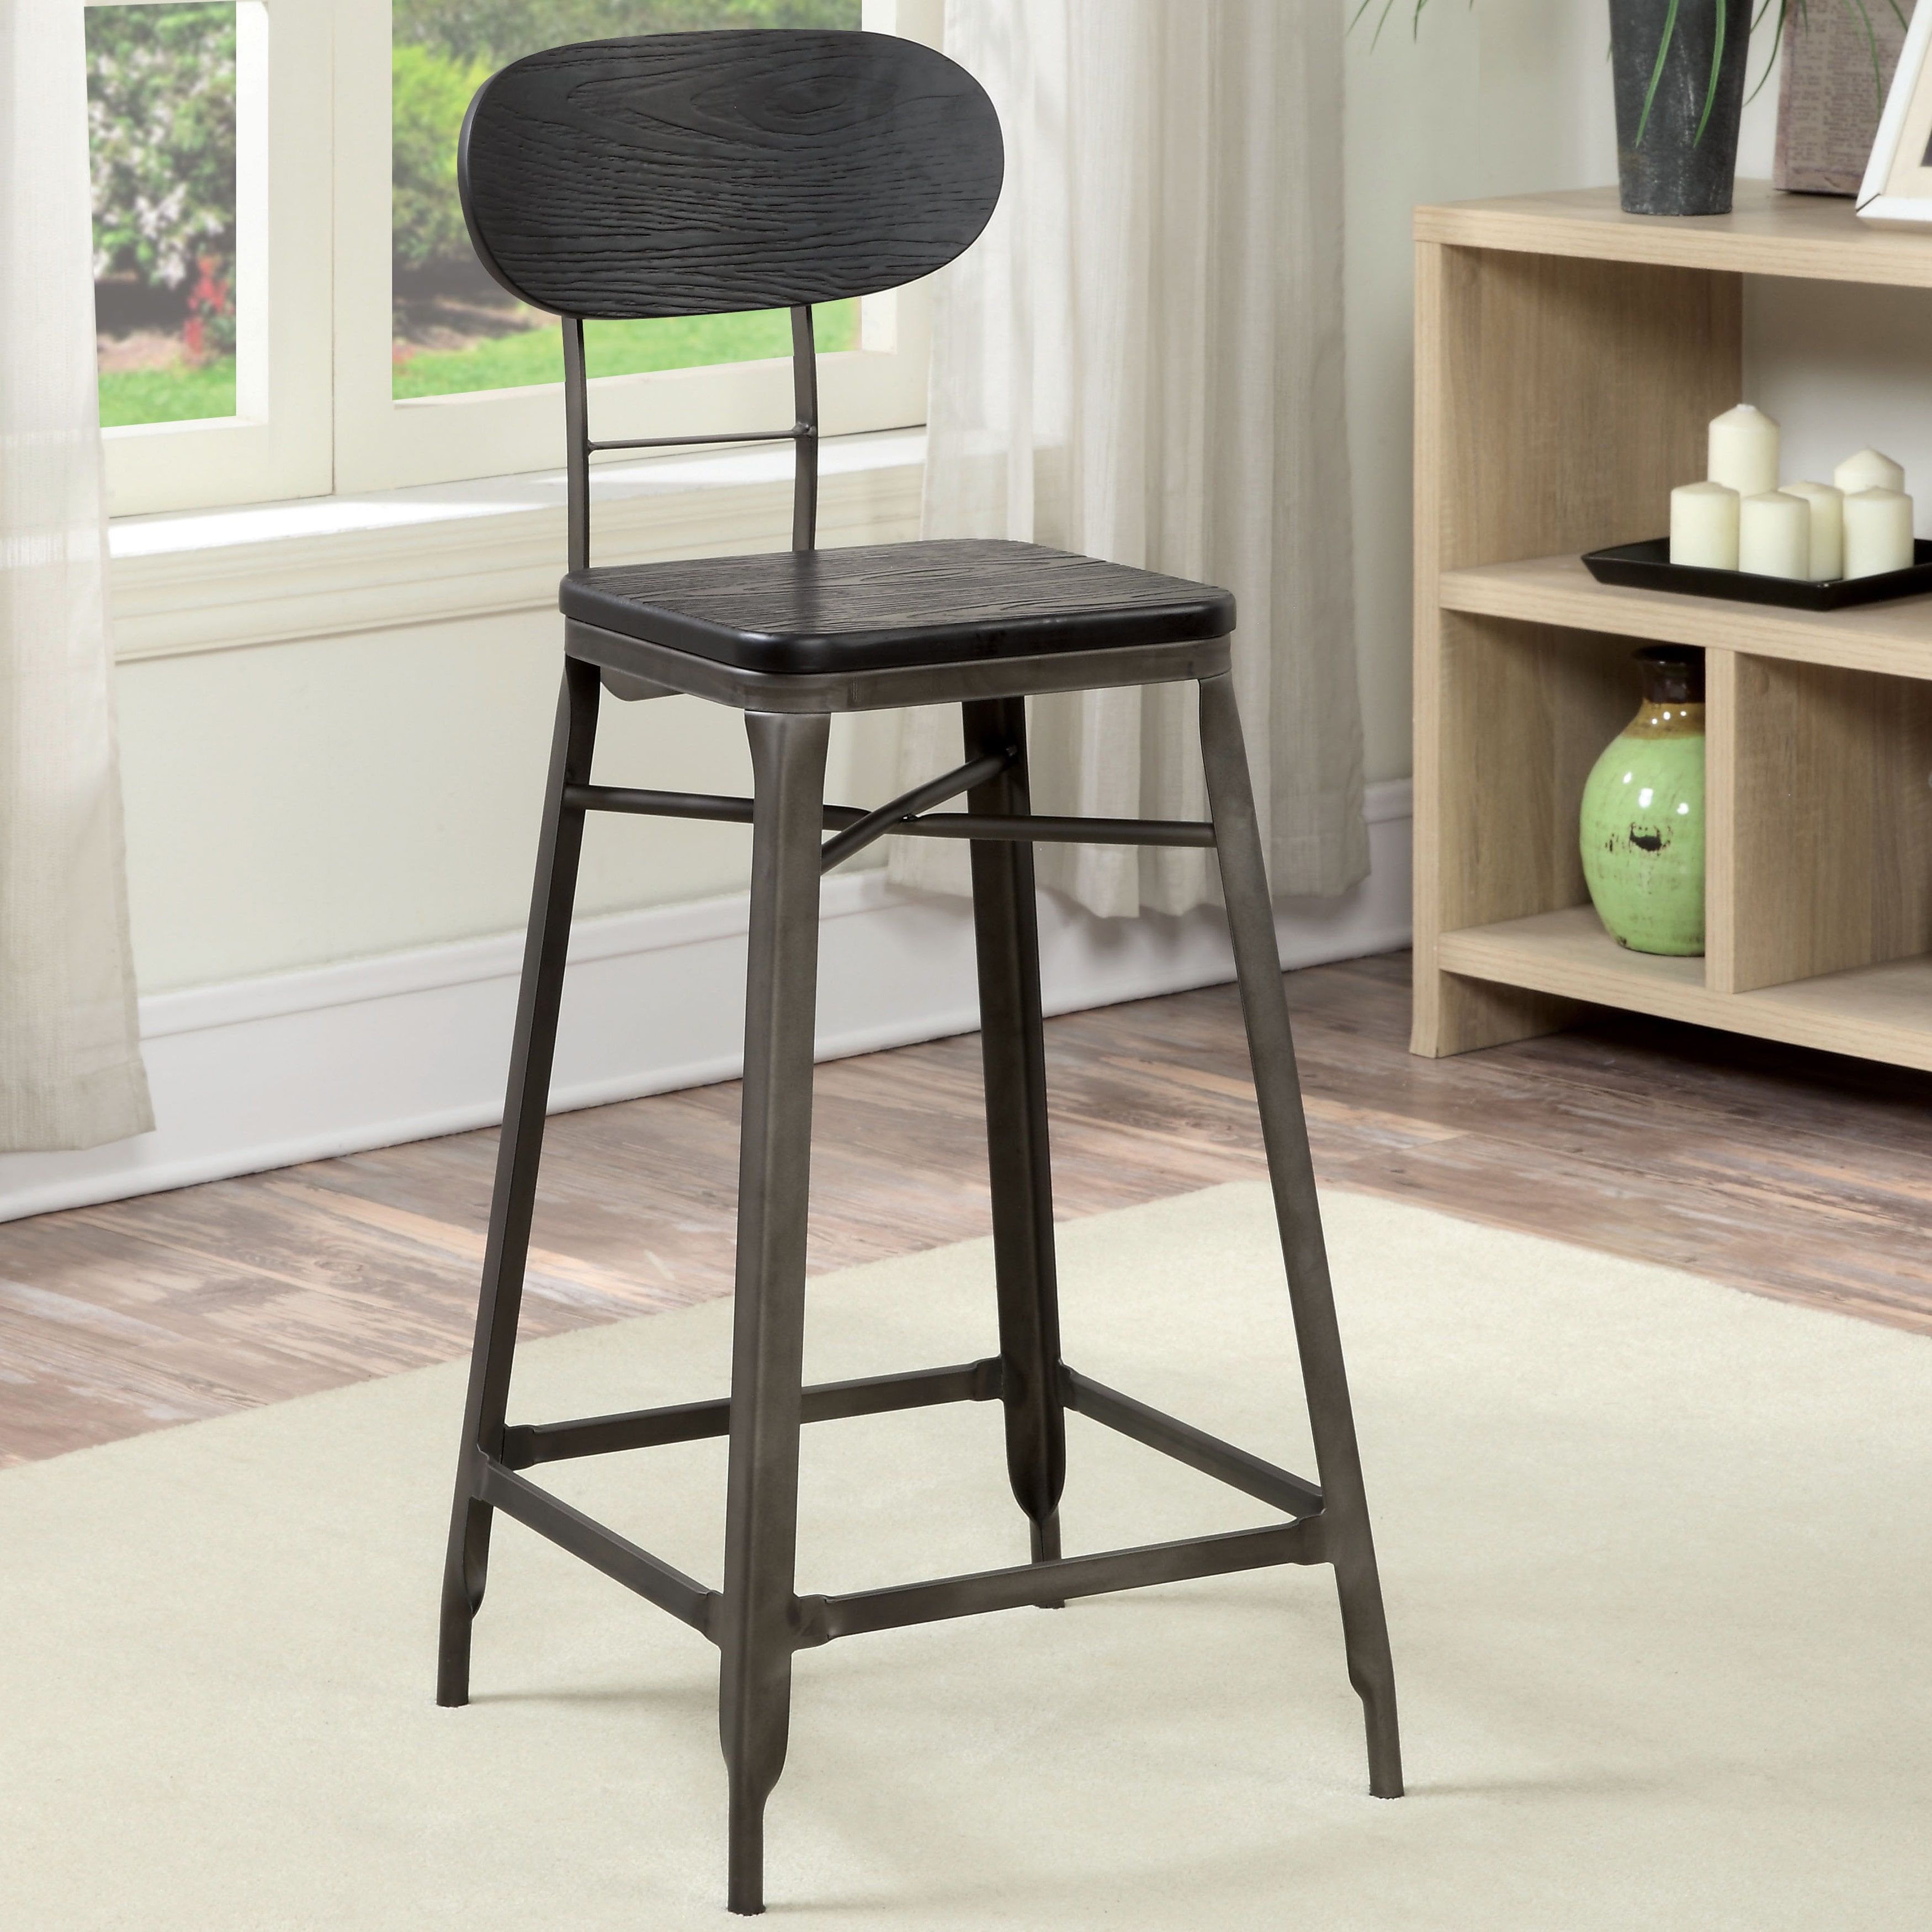 Furniture of America  Razen 26 - 29-inch Industrial Metal Bar Chair